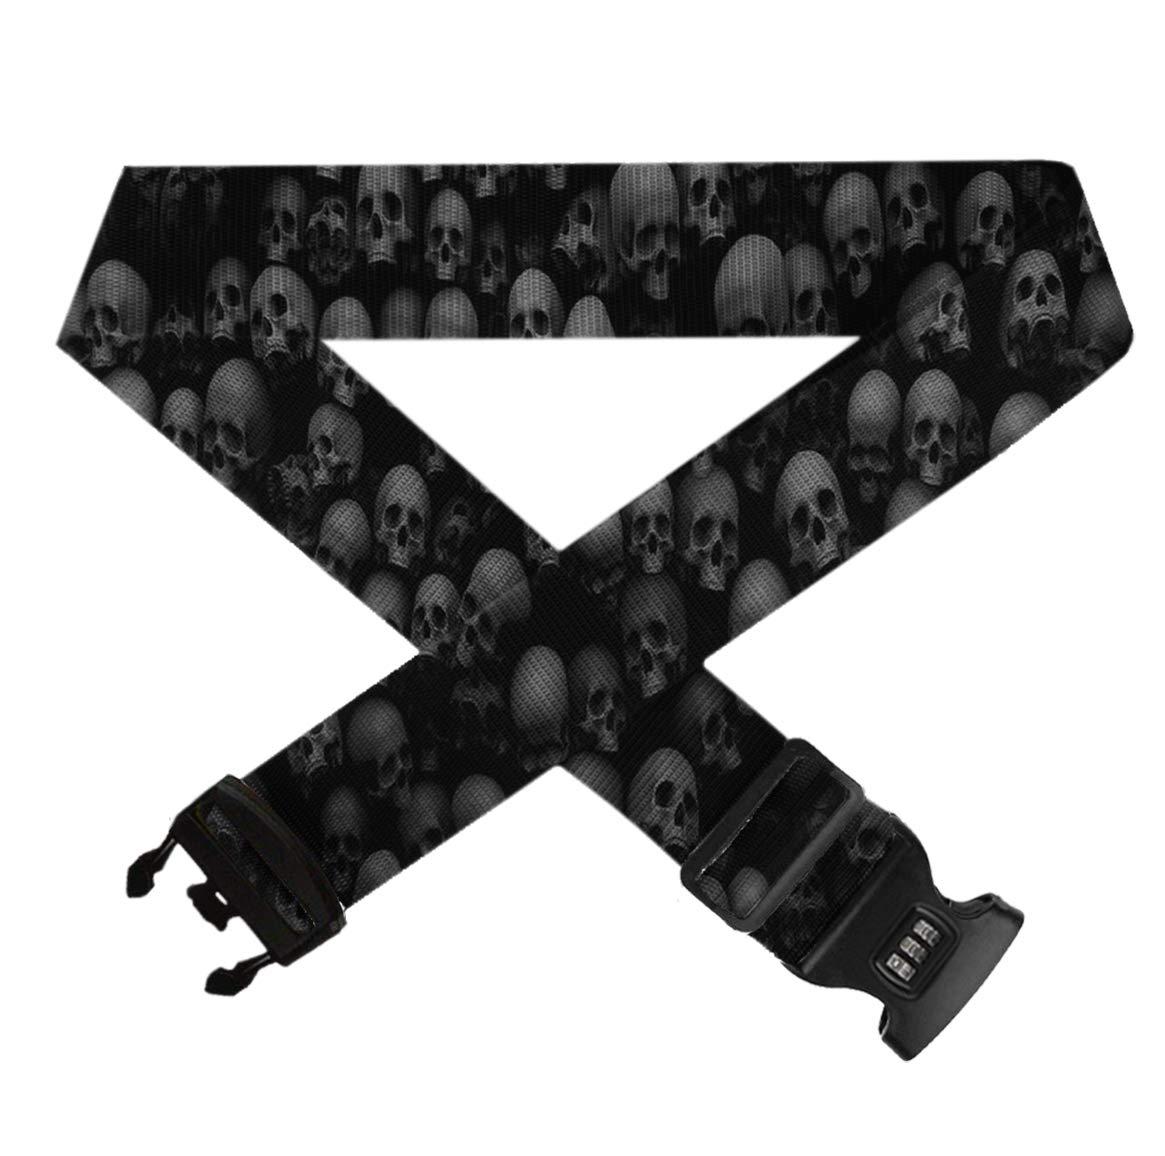 1 Pack Suitcase Belt Adjustable Luggage Strap TSA 3-dial Combination Lock GLORY ART Black Skull Head Travel Luggage Straps